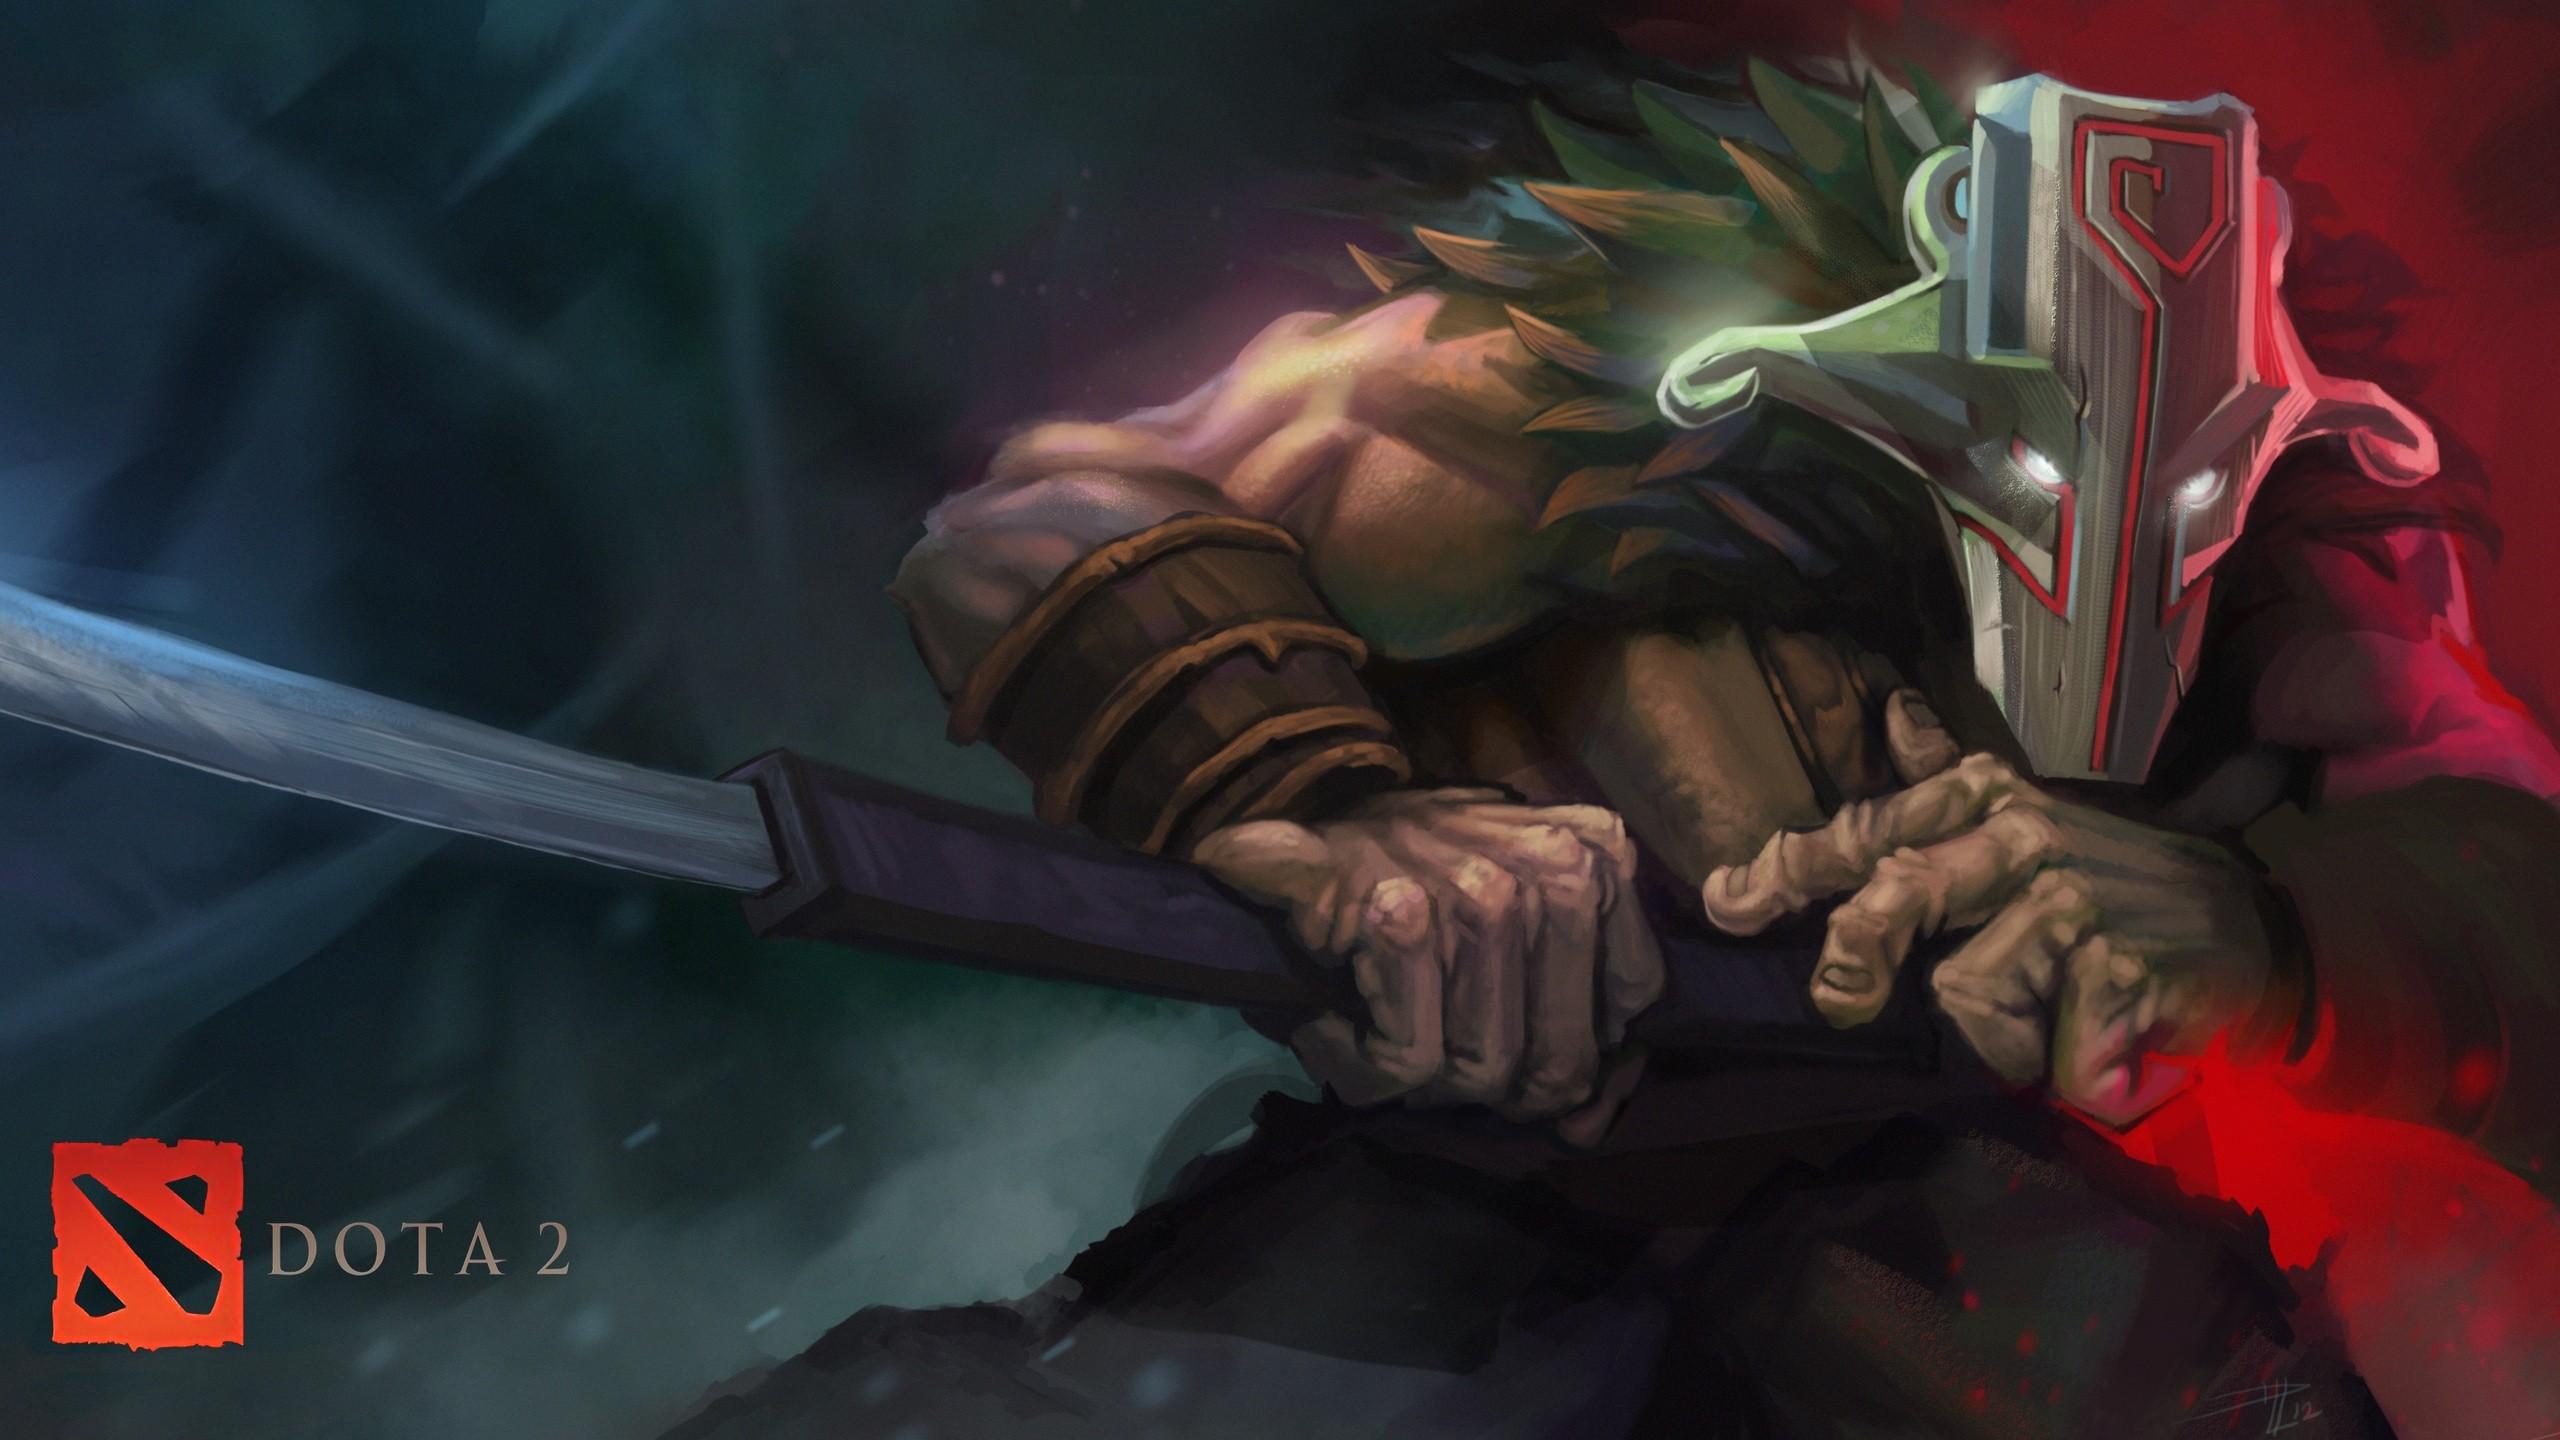 General 2560x1440 Dota 2 Dota Defense of the ancient Valve Valve Corporation Juggernaut video games